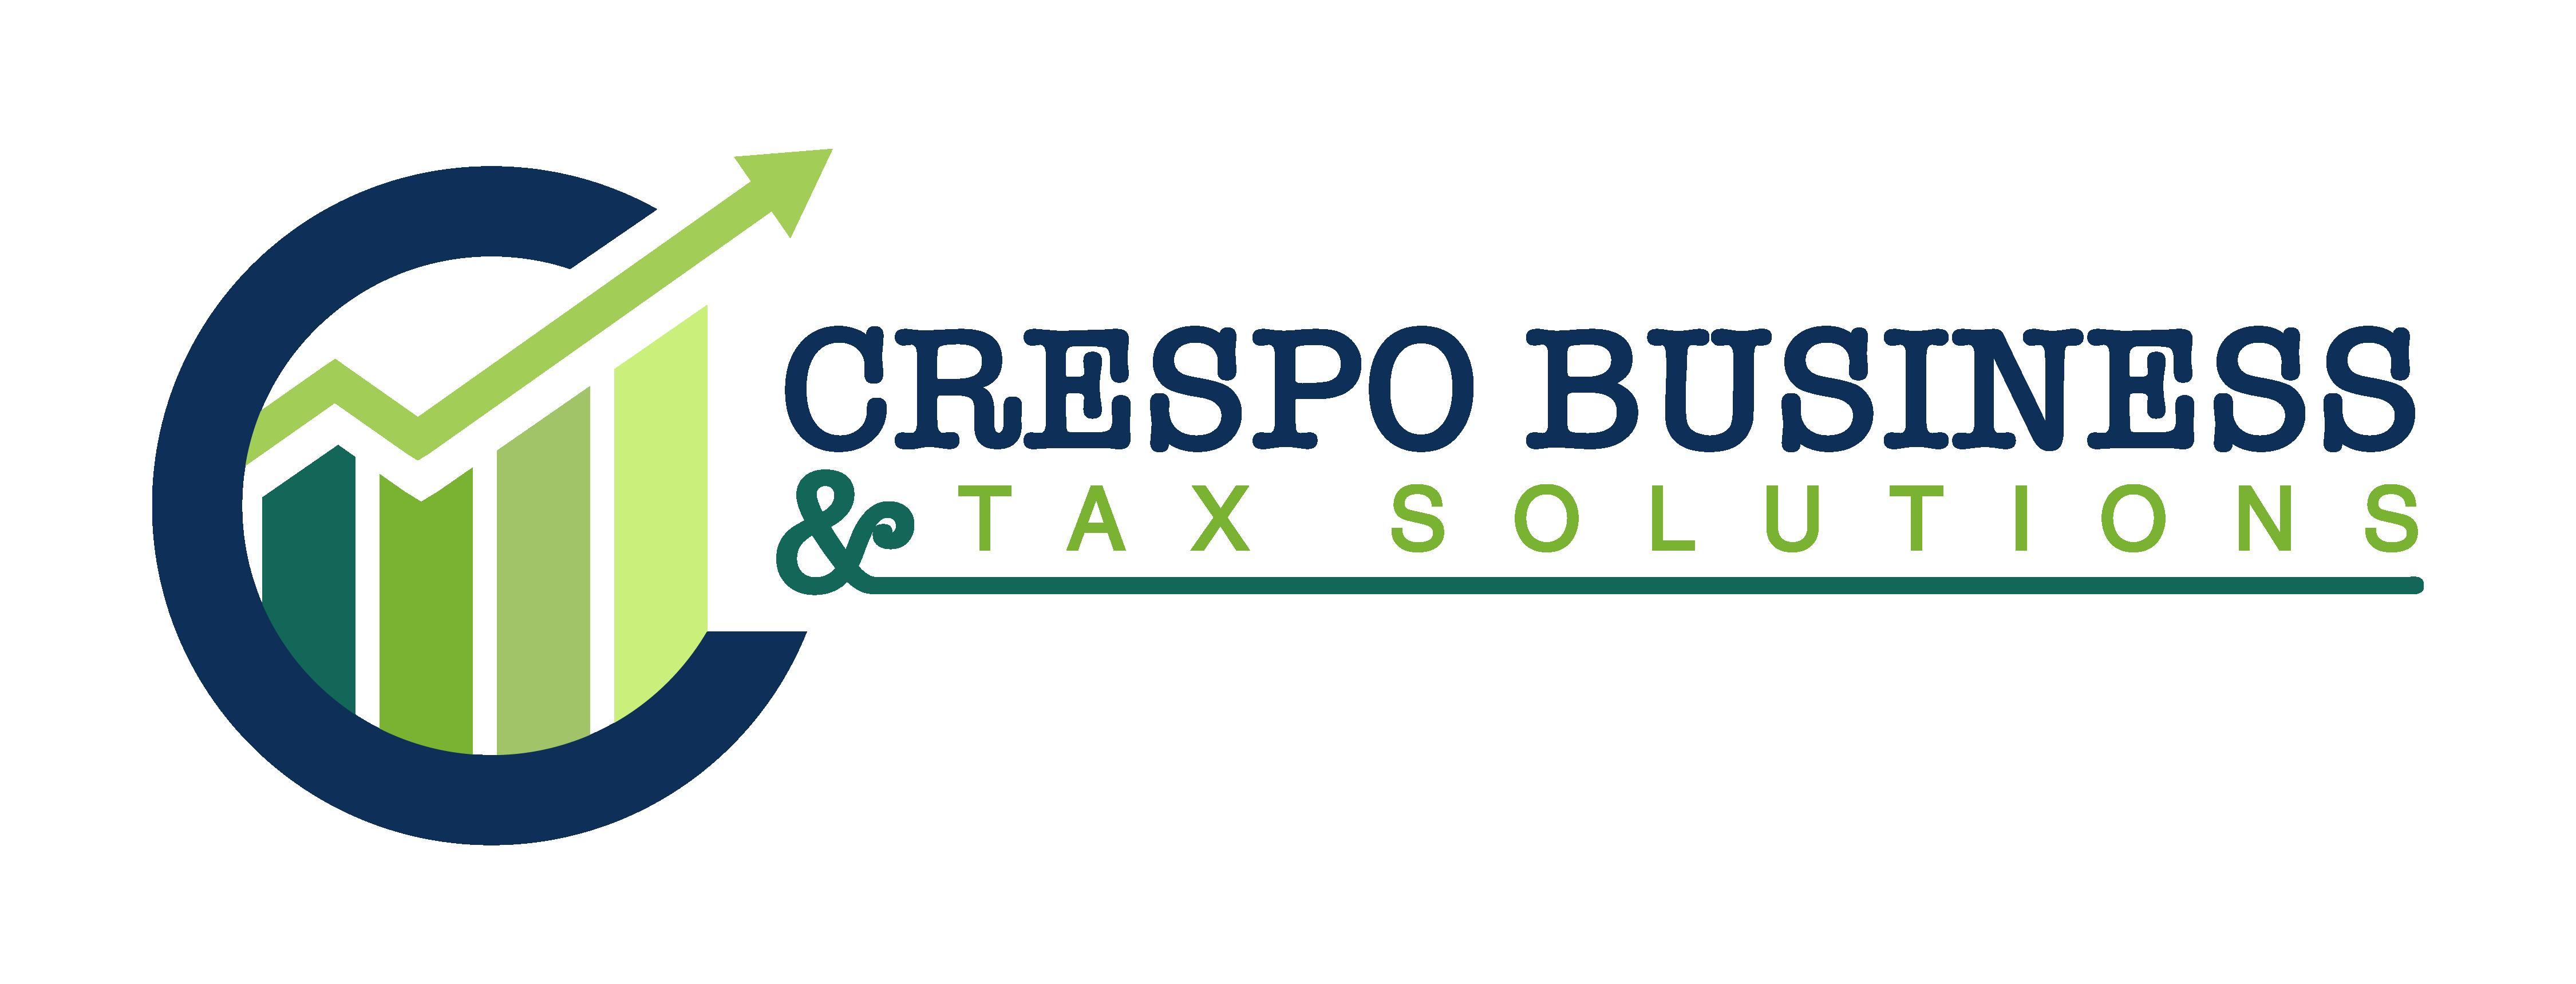 CRESPO BUSINESS & TAX SOLUTIONS, LLC